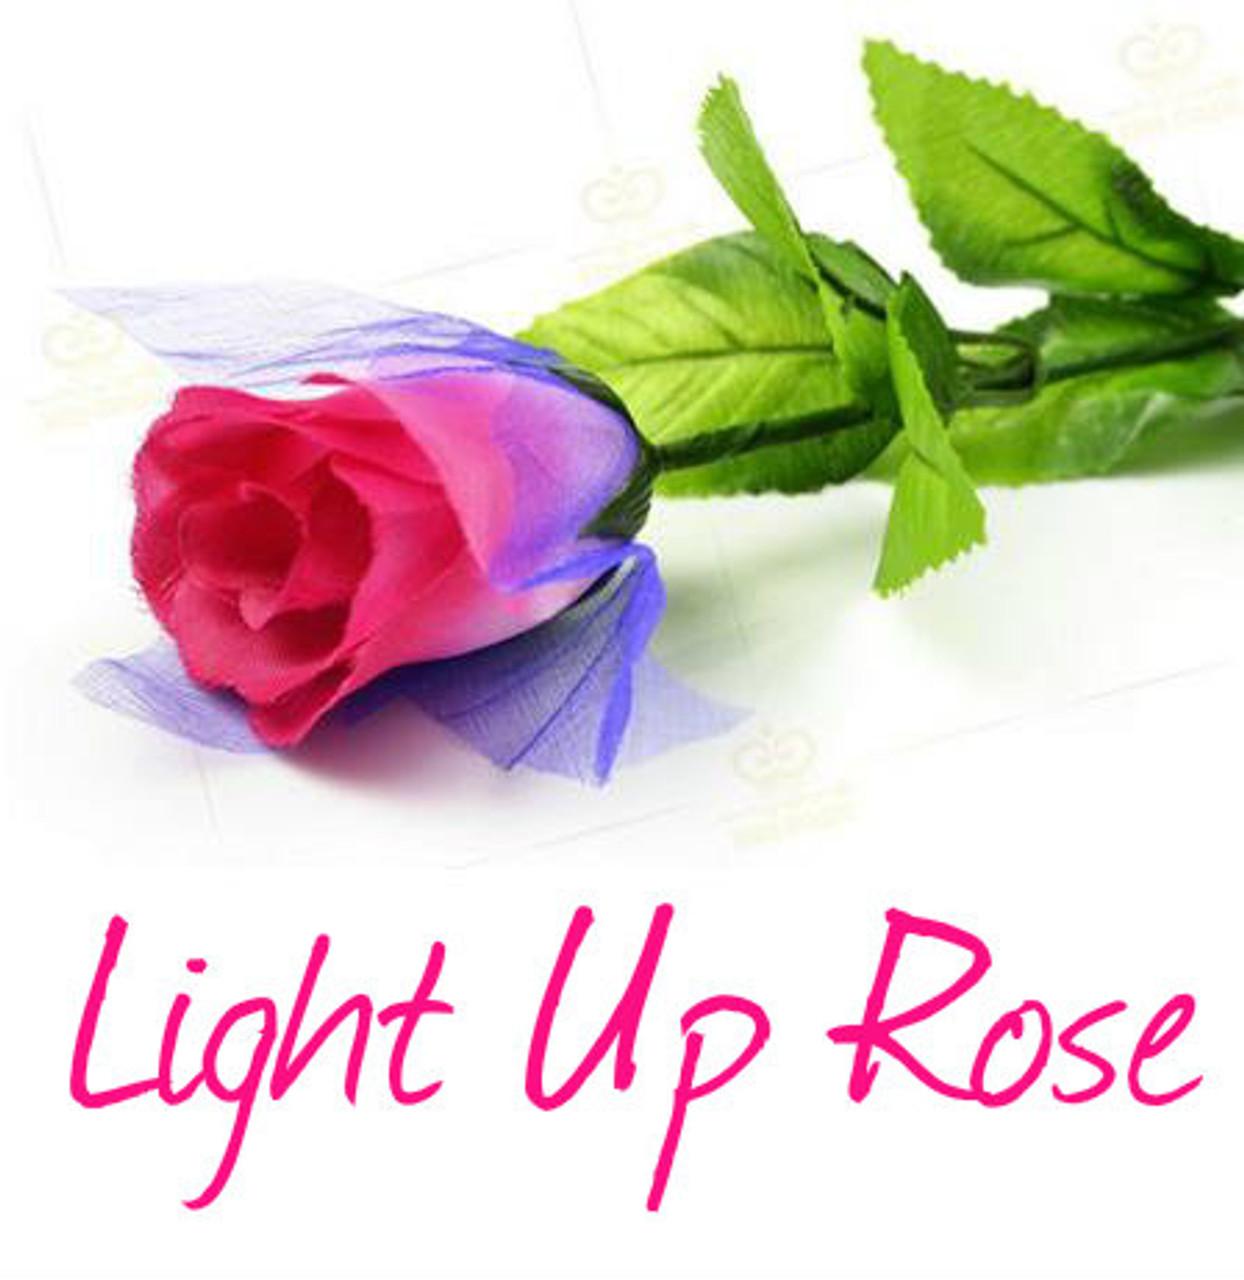 Light Up Rose Magic Trick